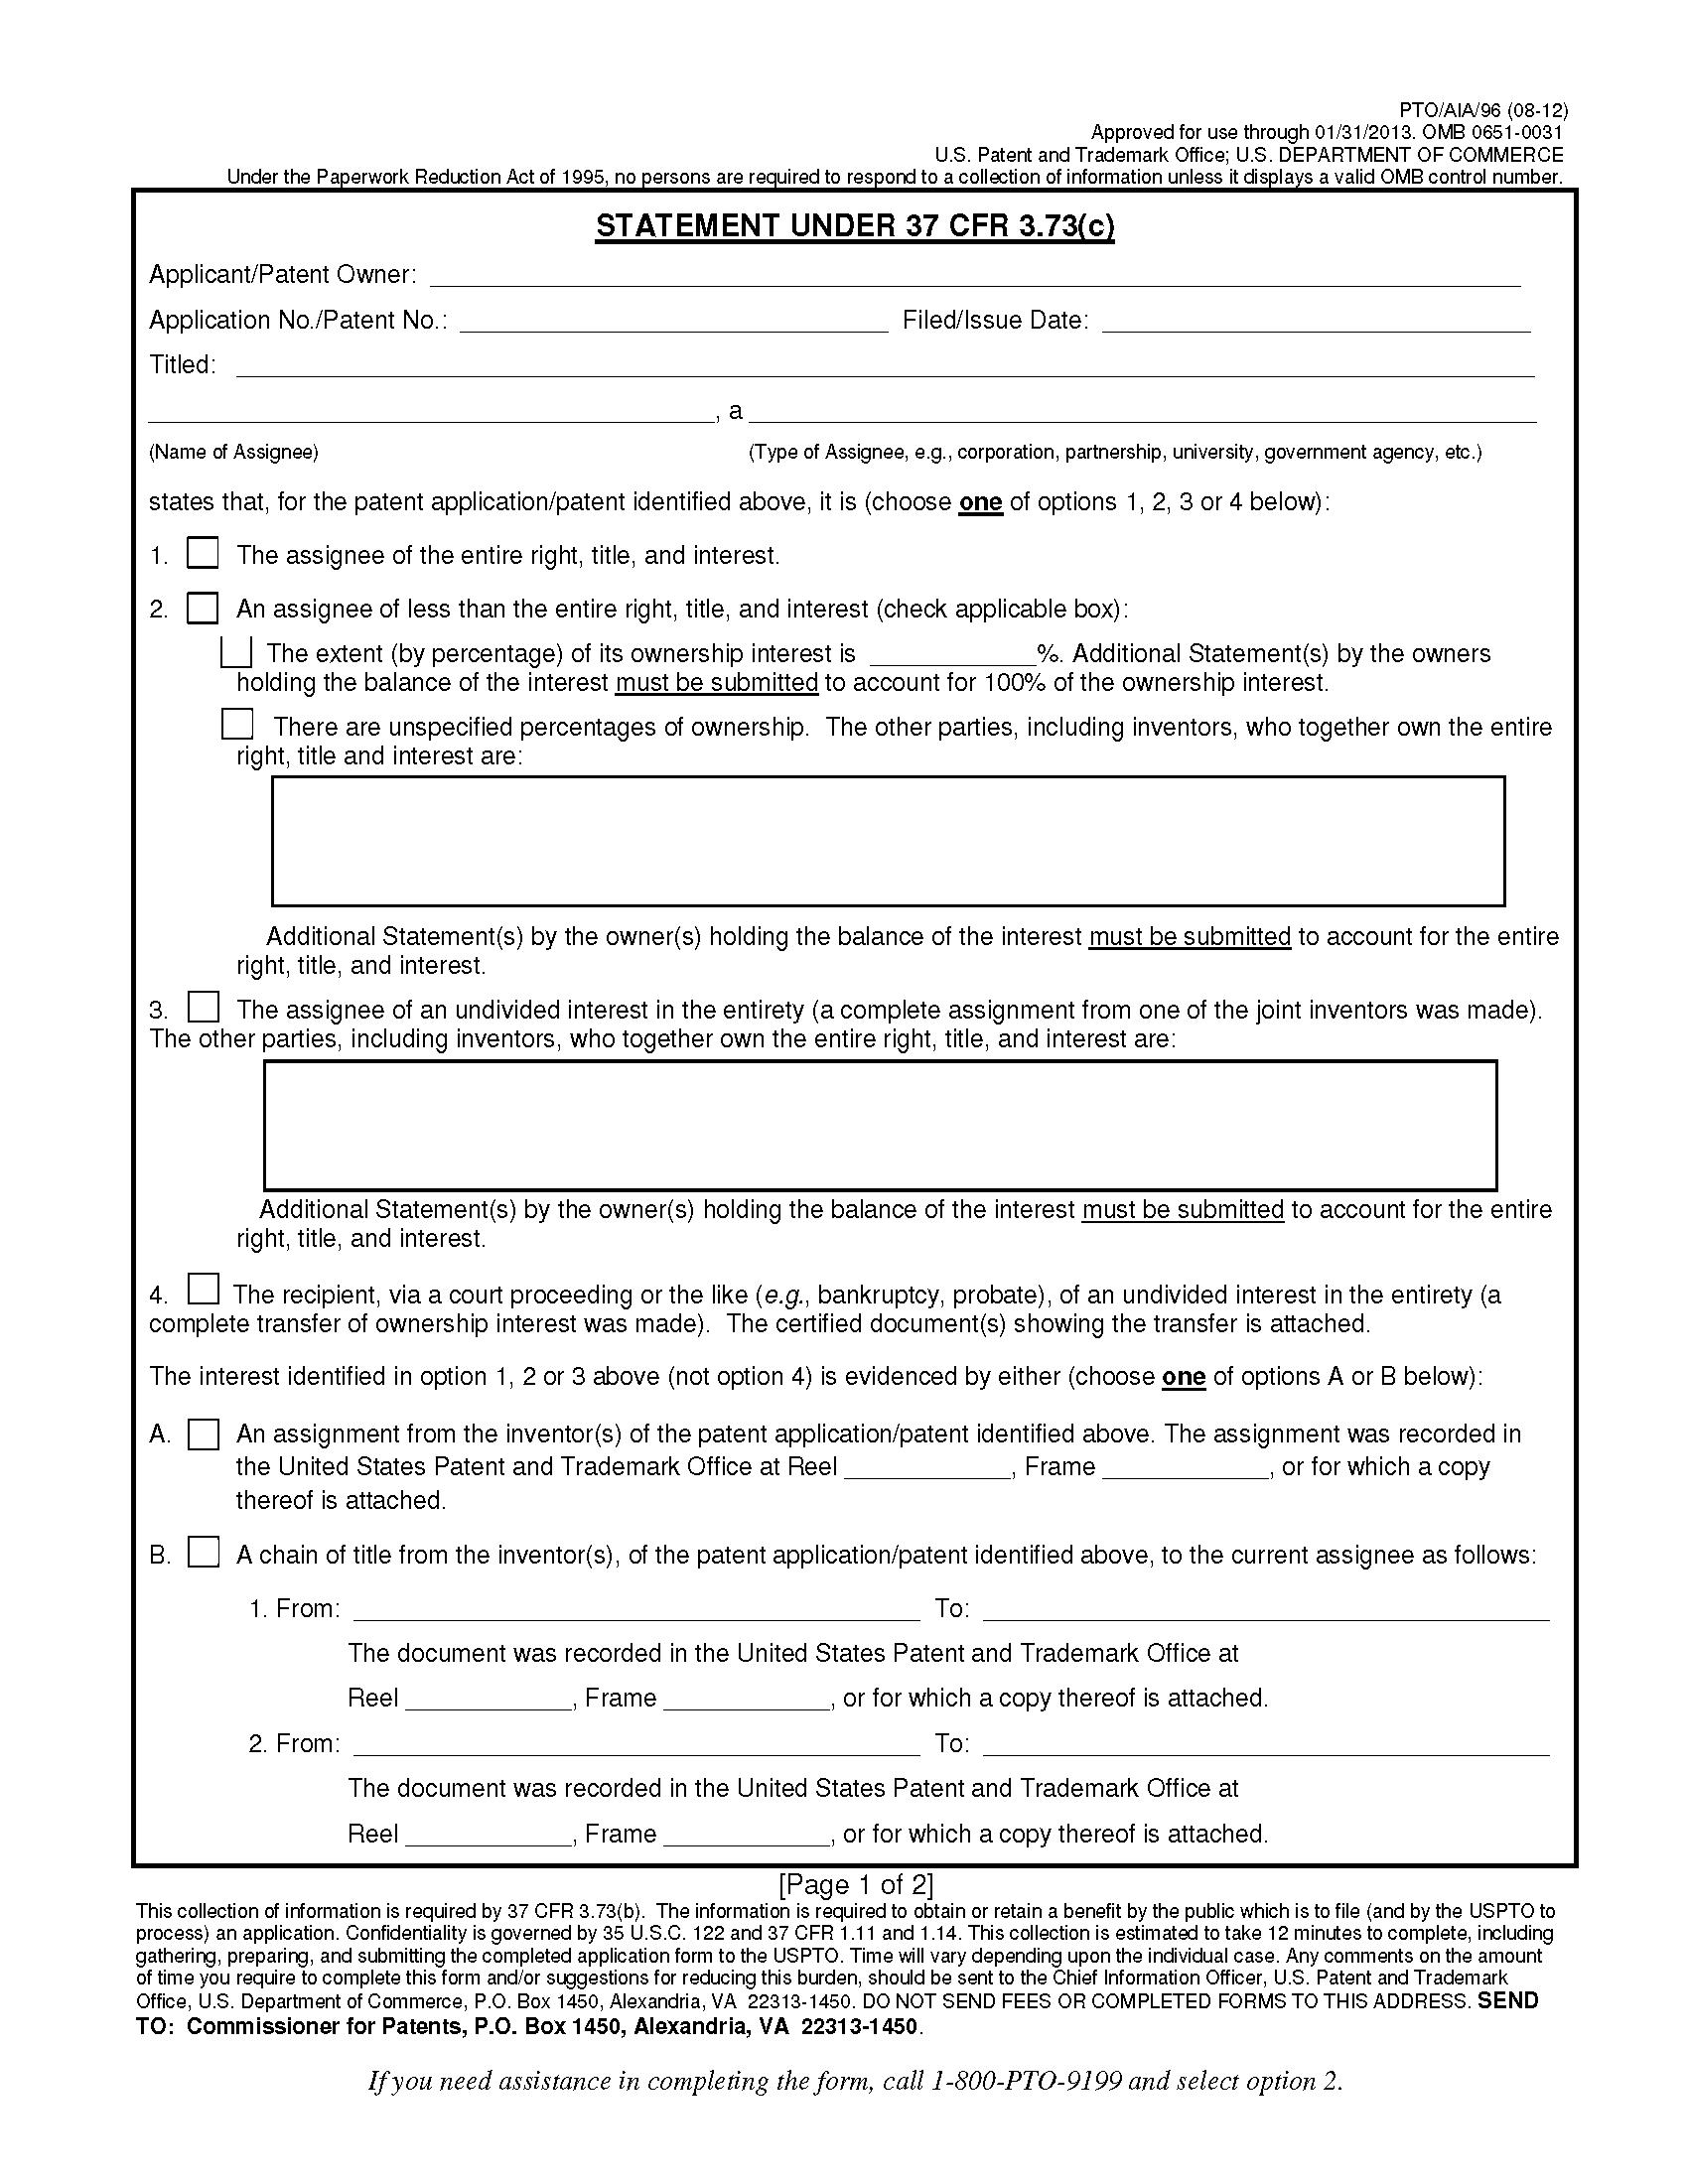 Form Pto/aia/96. Statement Under 37 Cfr 3.73(C),